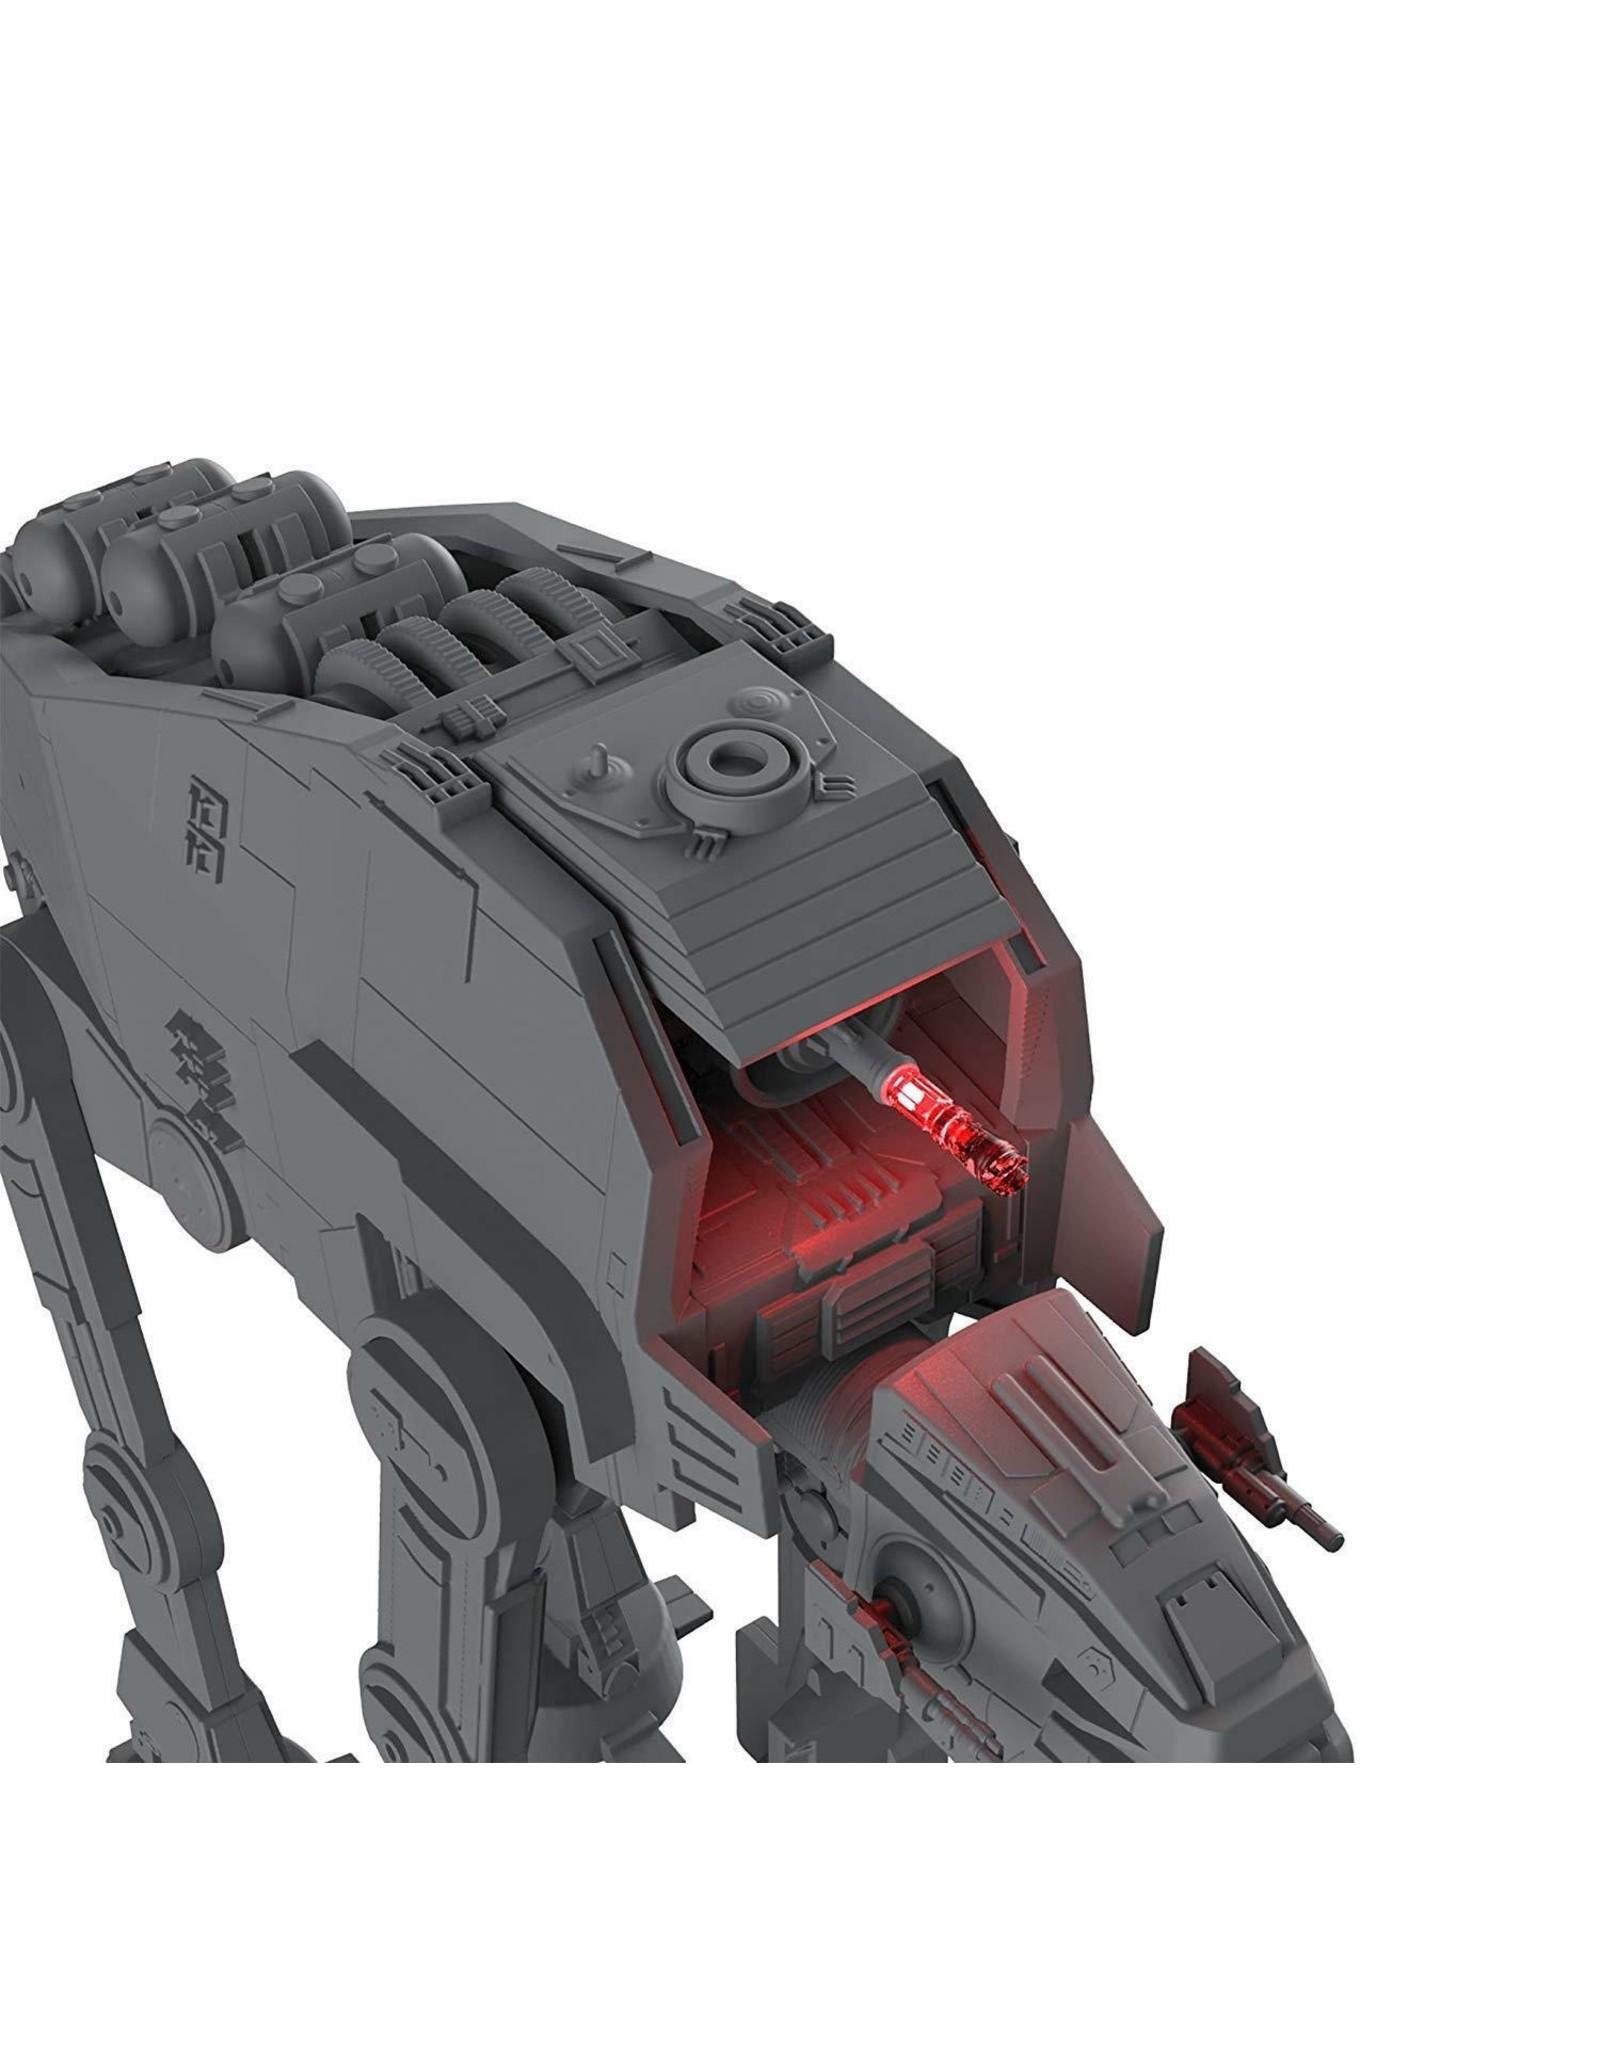 Star Wars First Order Heavy Assault Walker - 1:164 - Revell